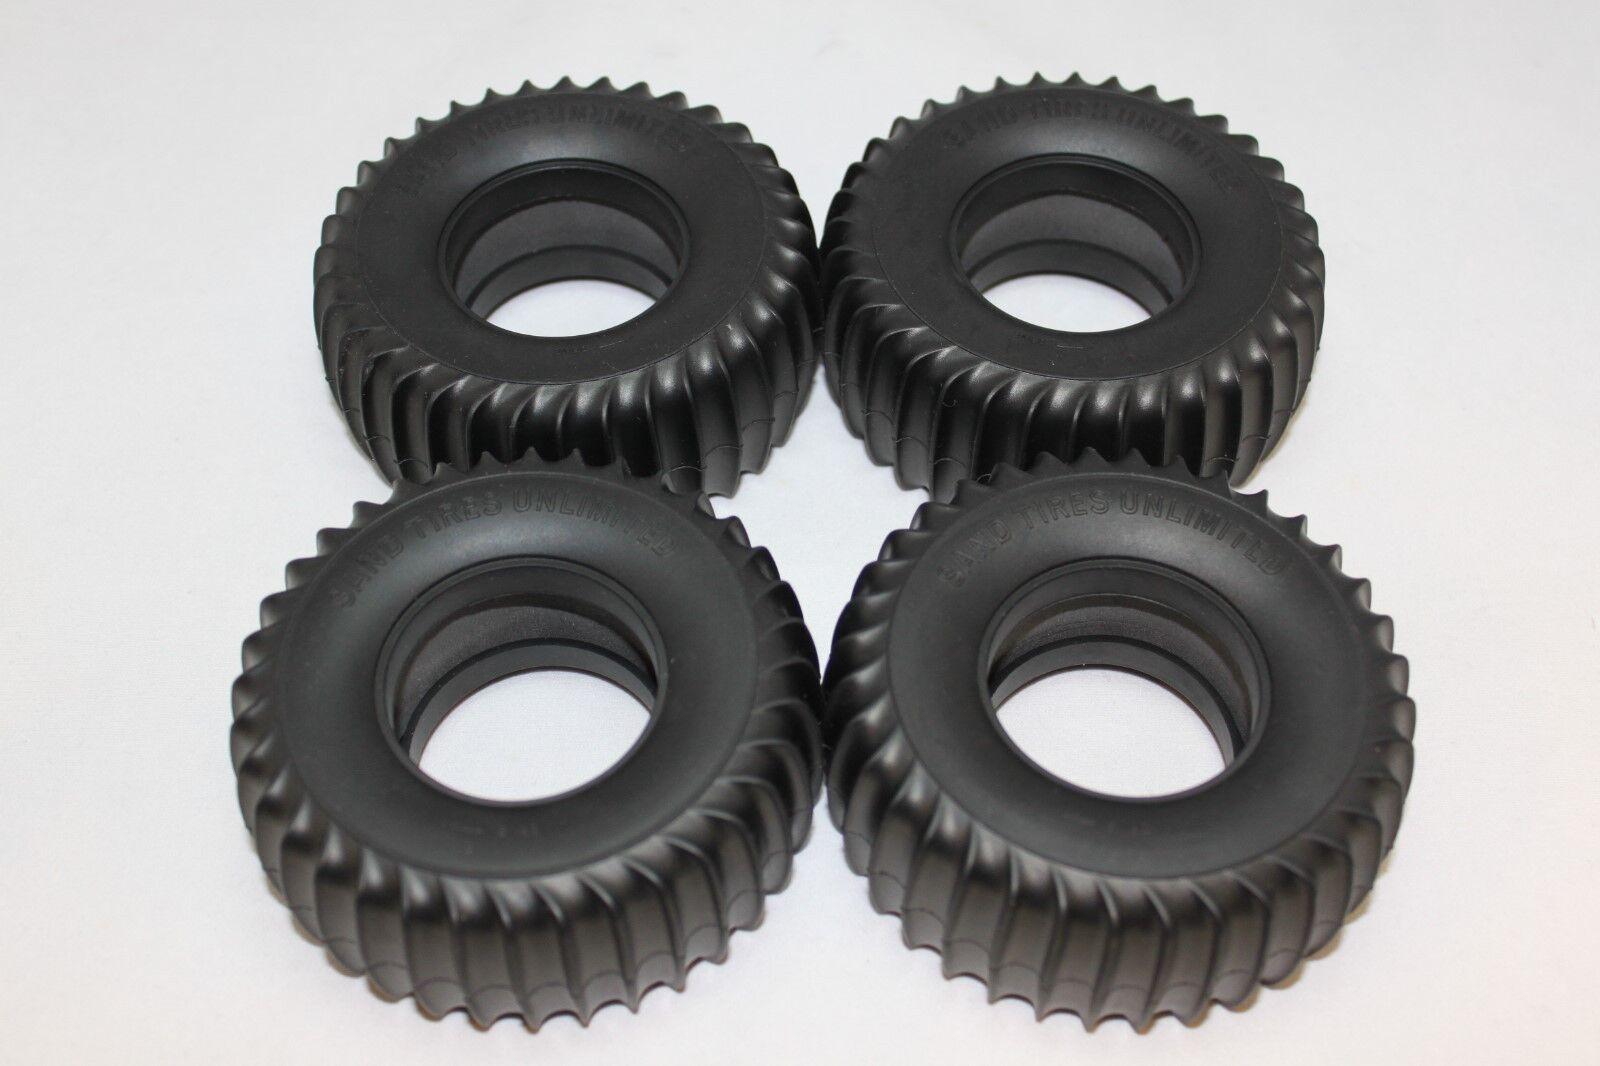 Neumáticos Set Con Insertos Para Tamiya ardiente Blazer 58029 Wild Willy I 58035